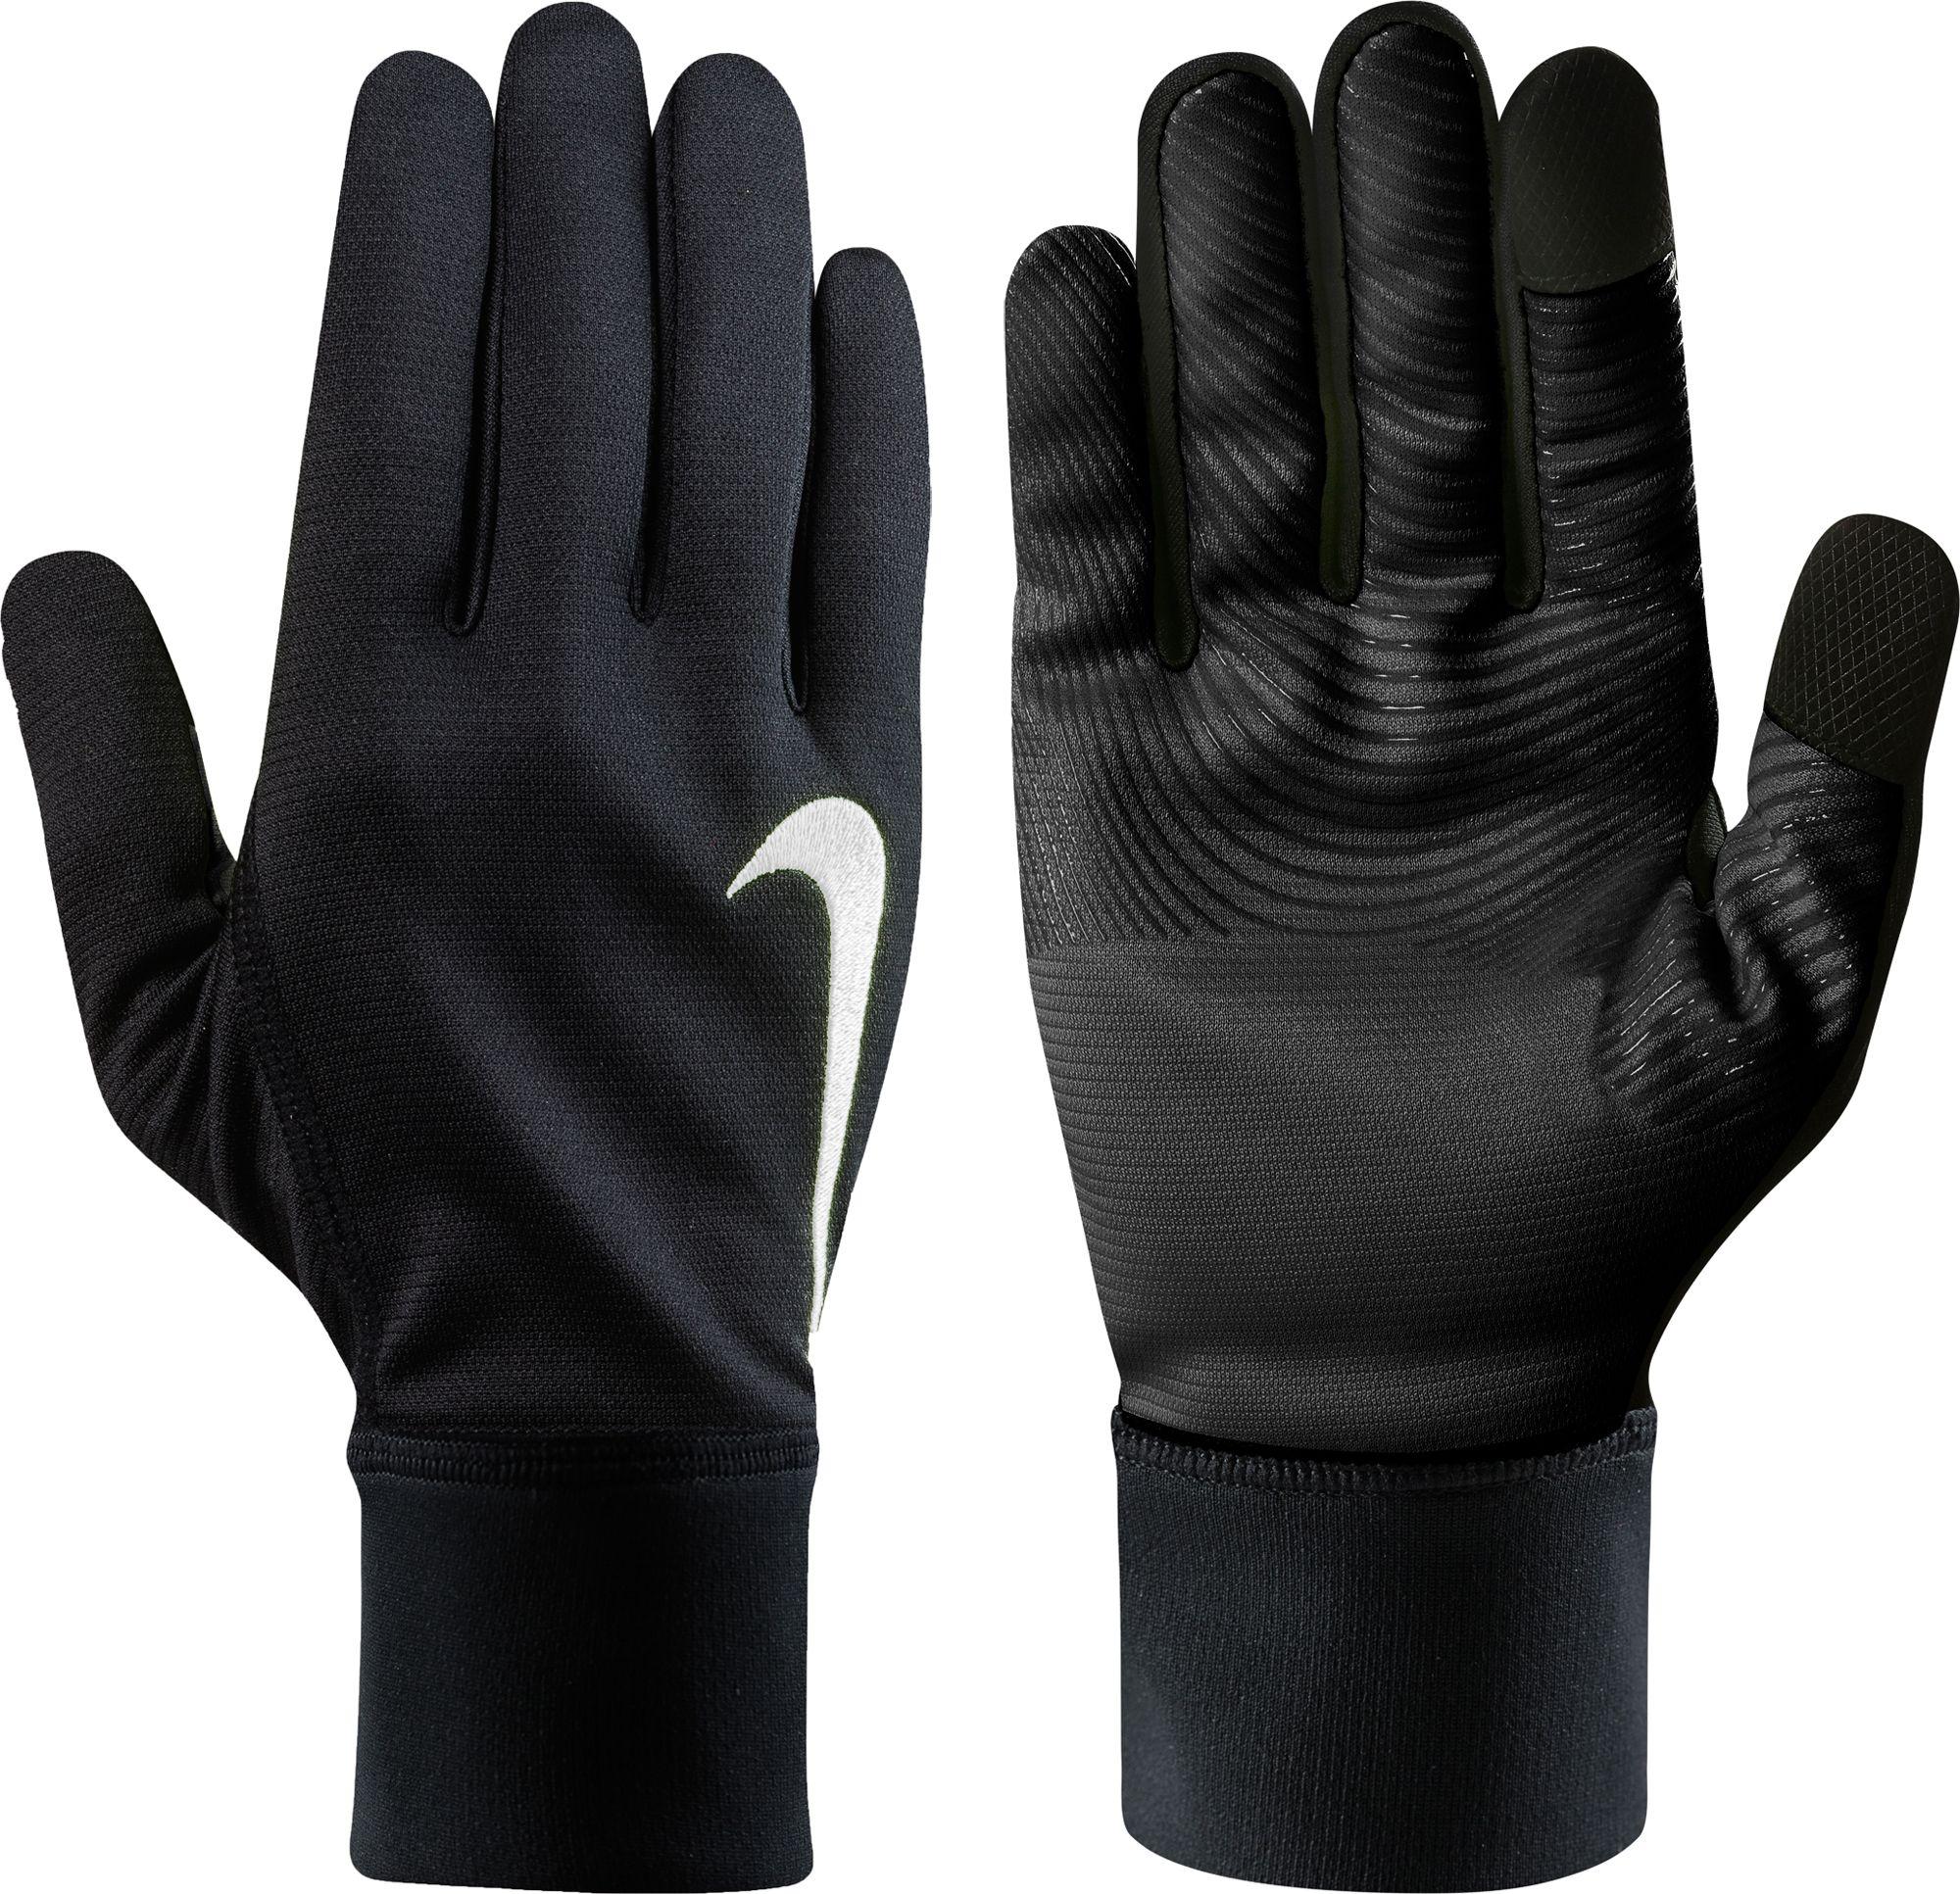 5024e4e0fa11 Nike Men s Therma-FIT Gloves